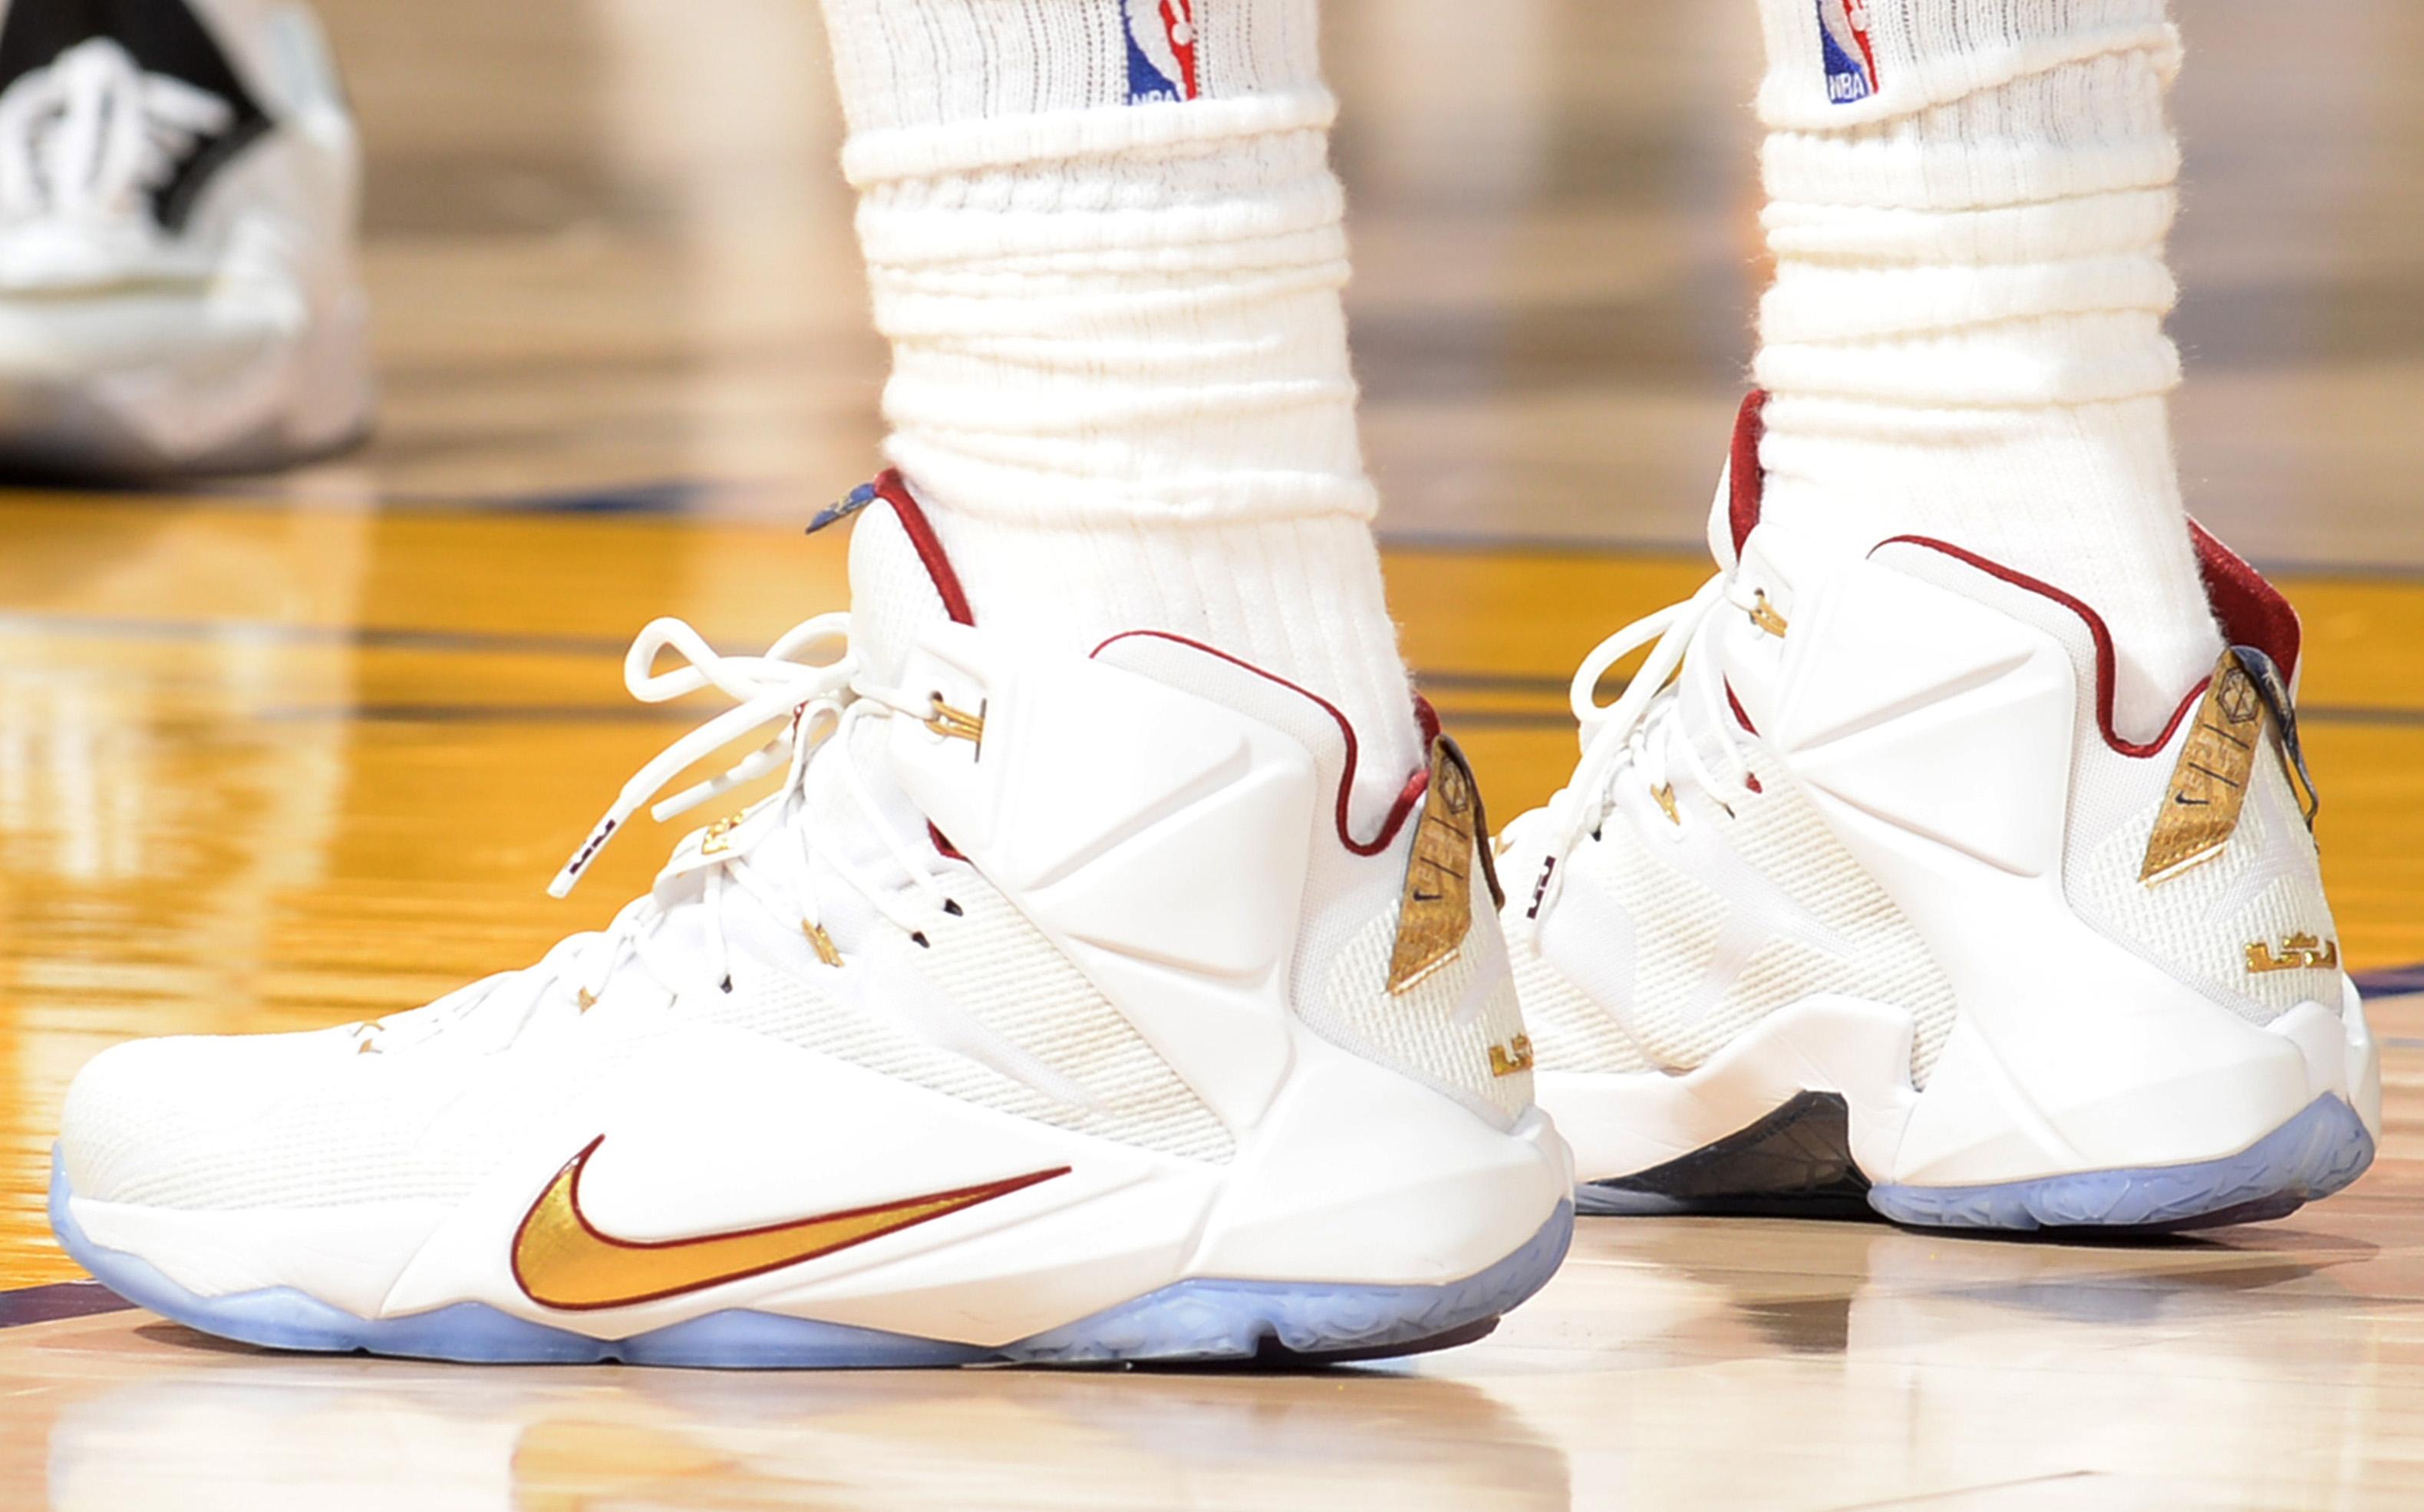 lebron james 2 shoes